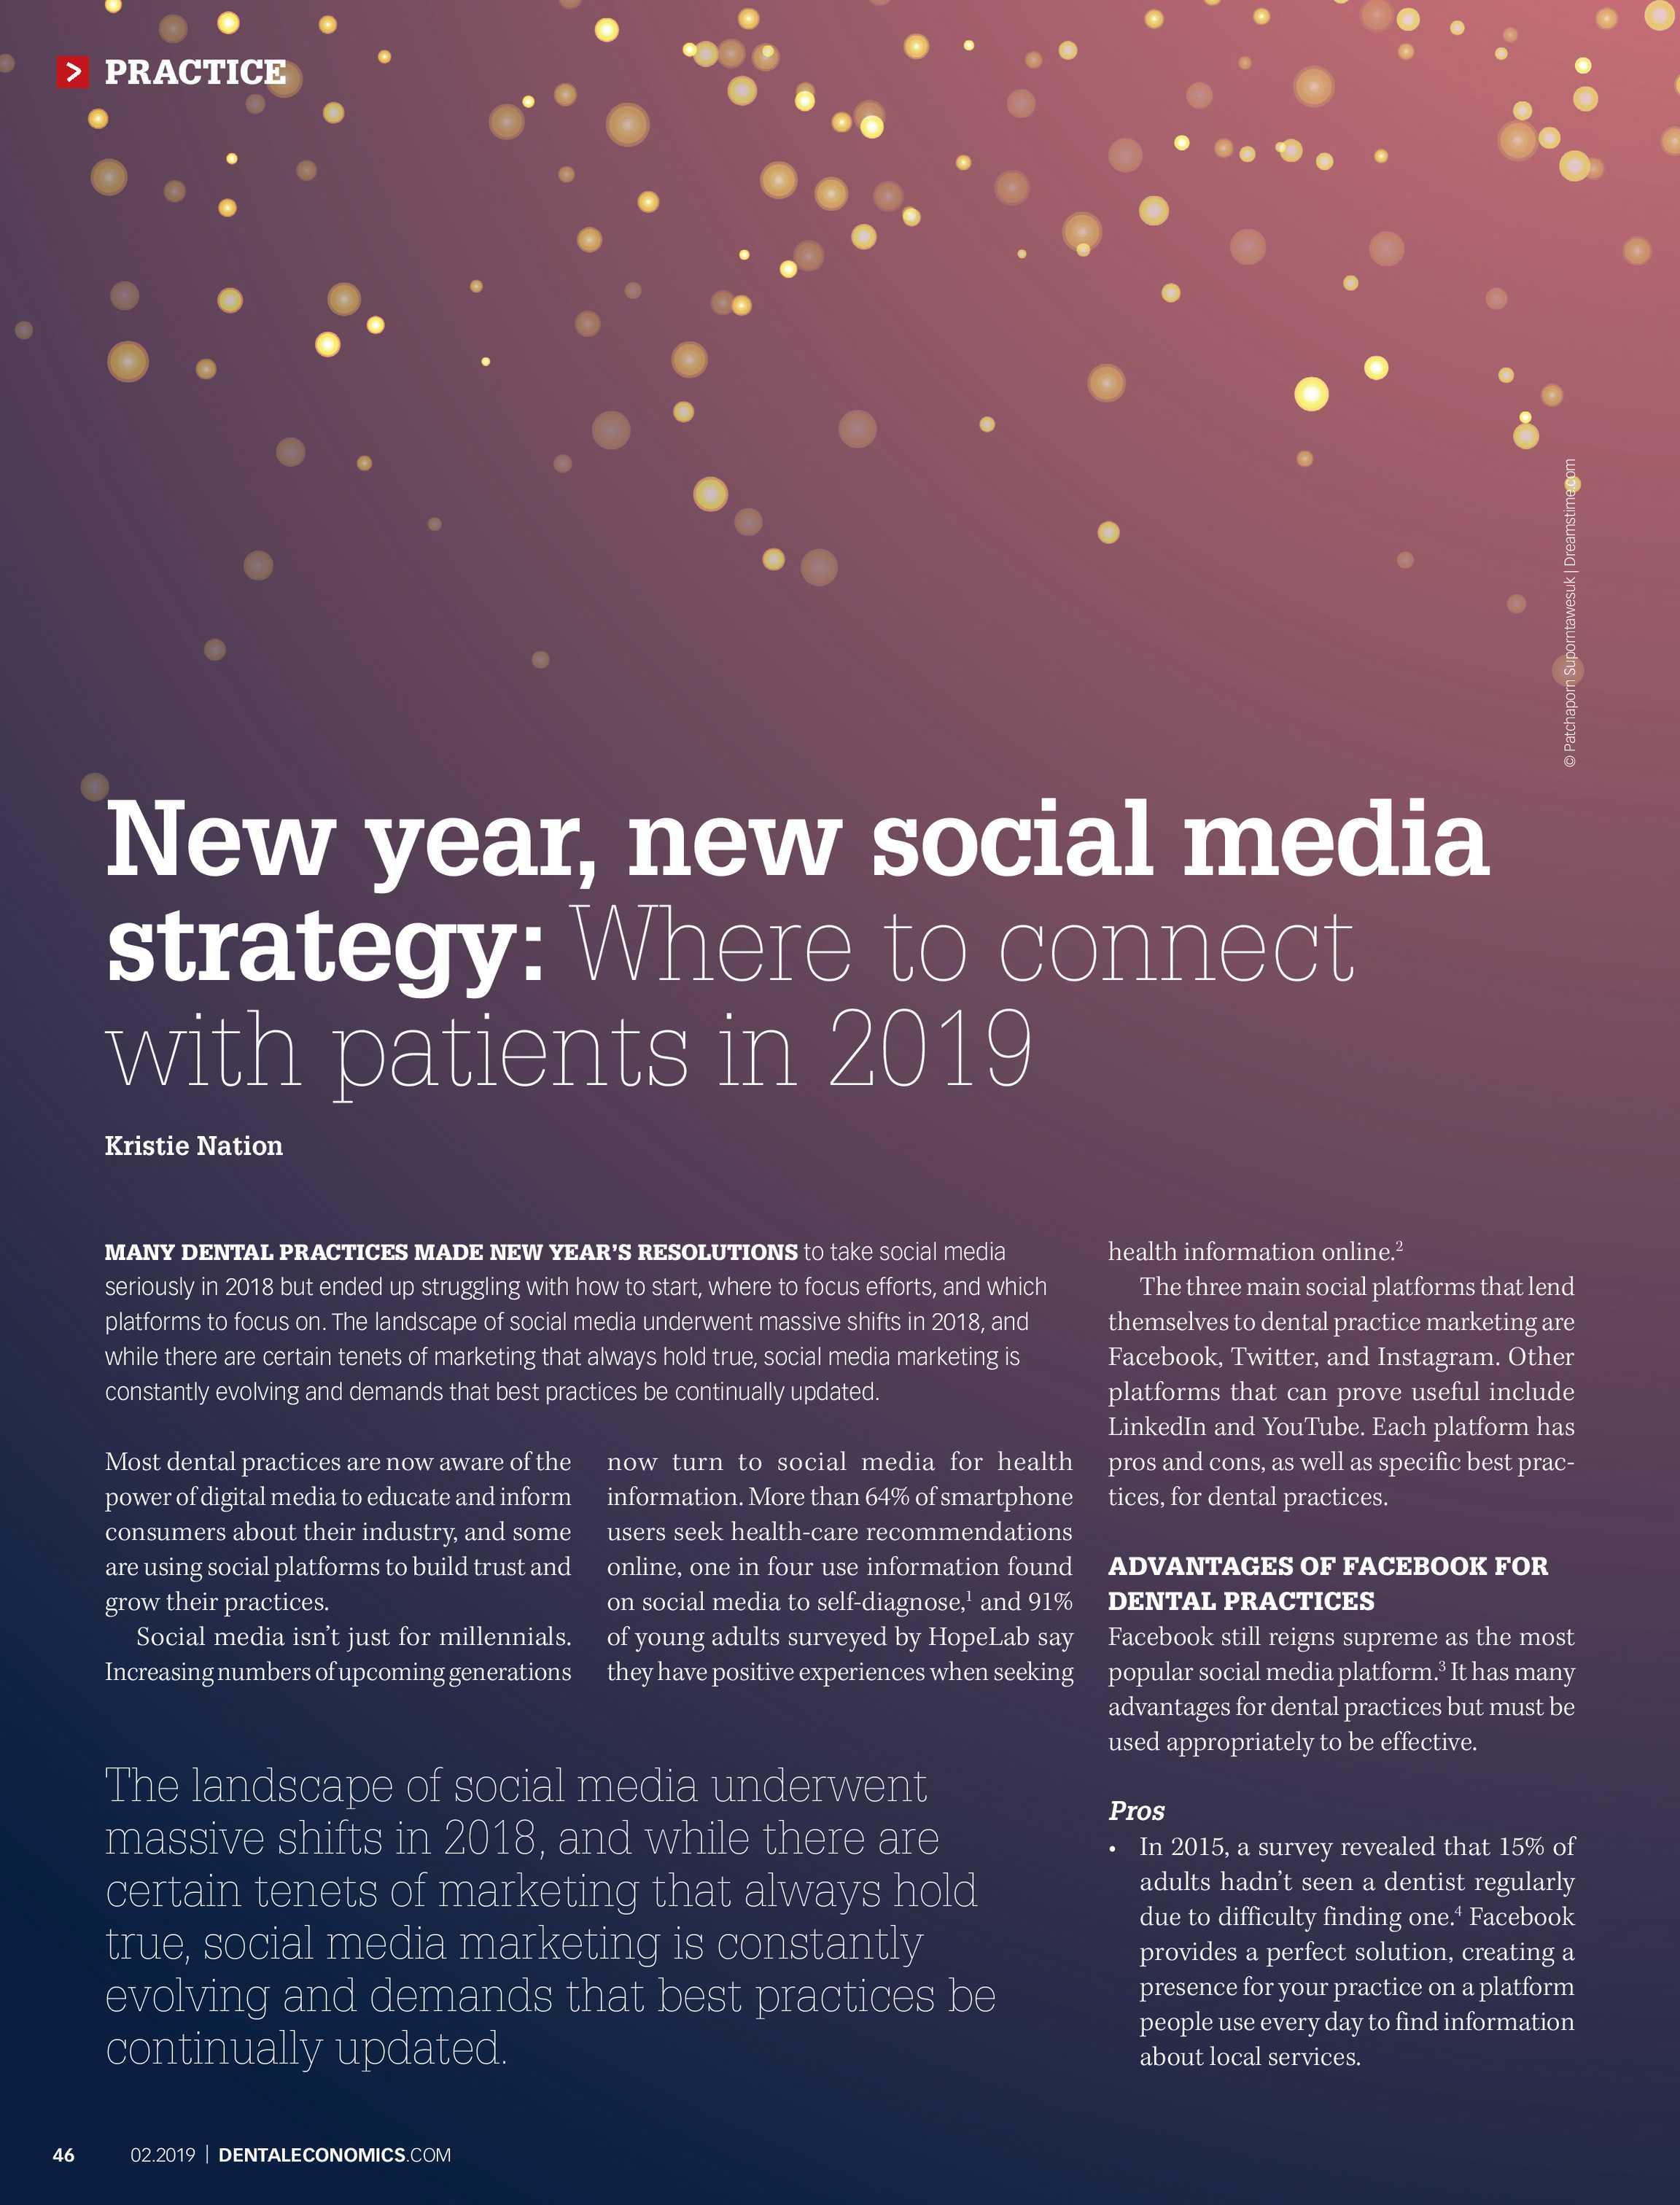 Dental Economics - February 2019 - page 46